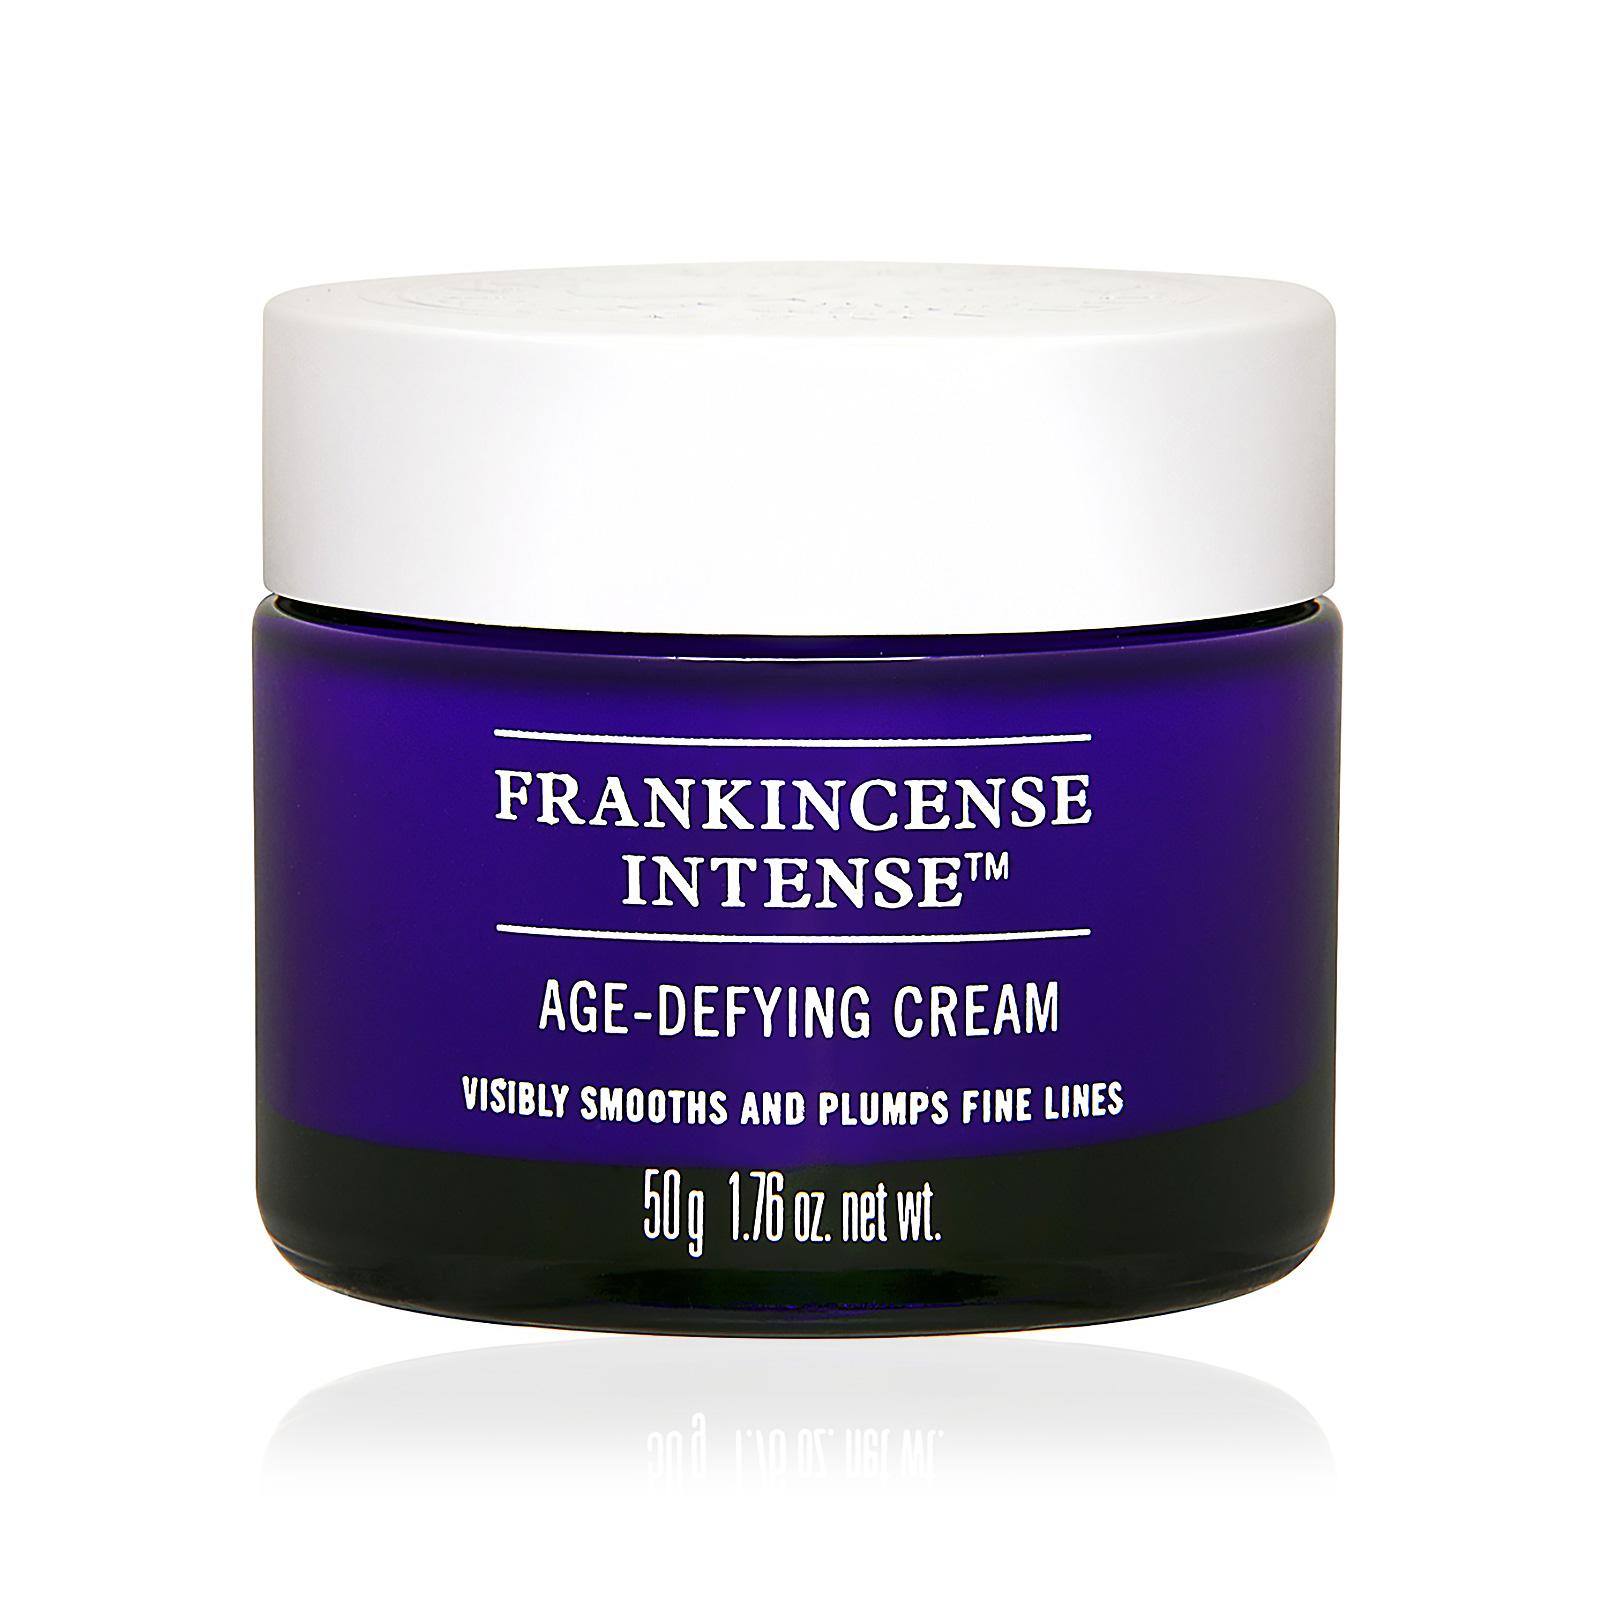 Frankincense Intense Age-Defying Cream